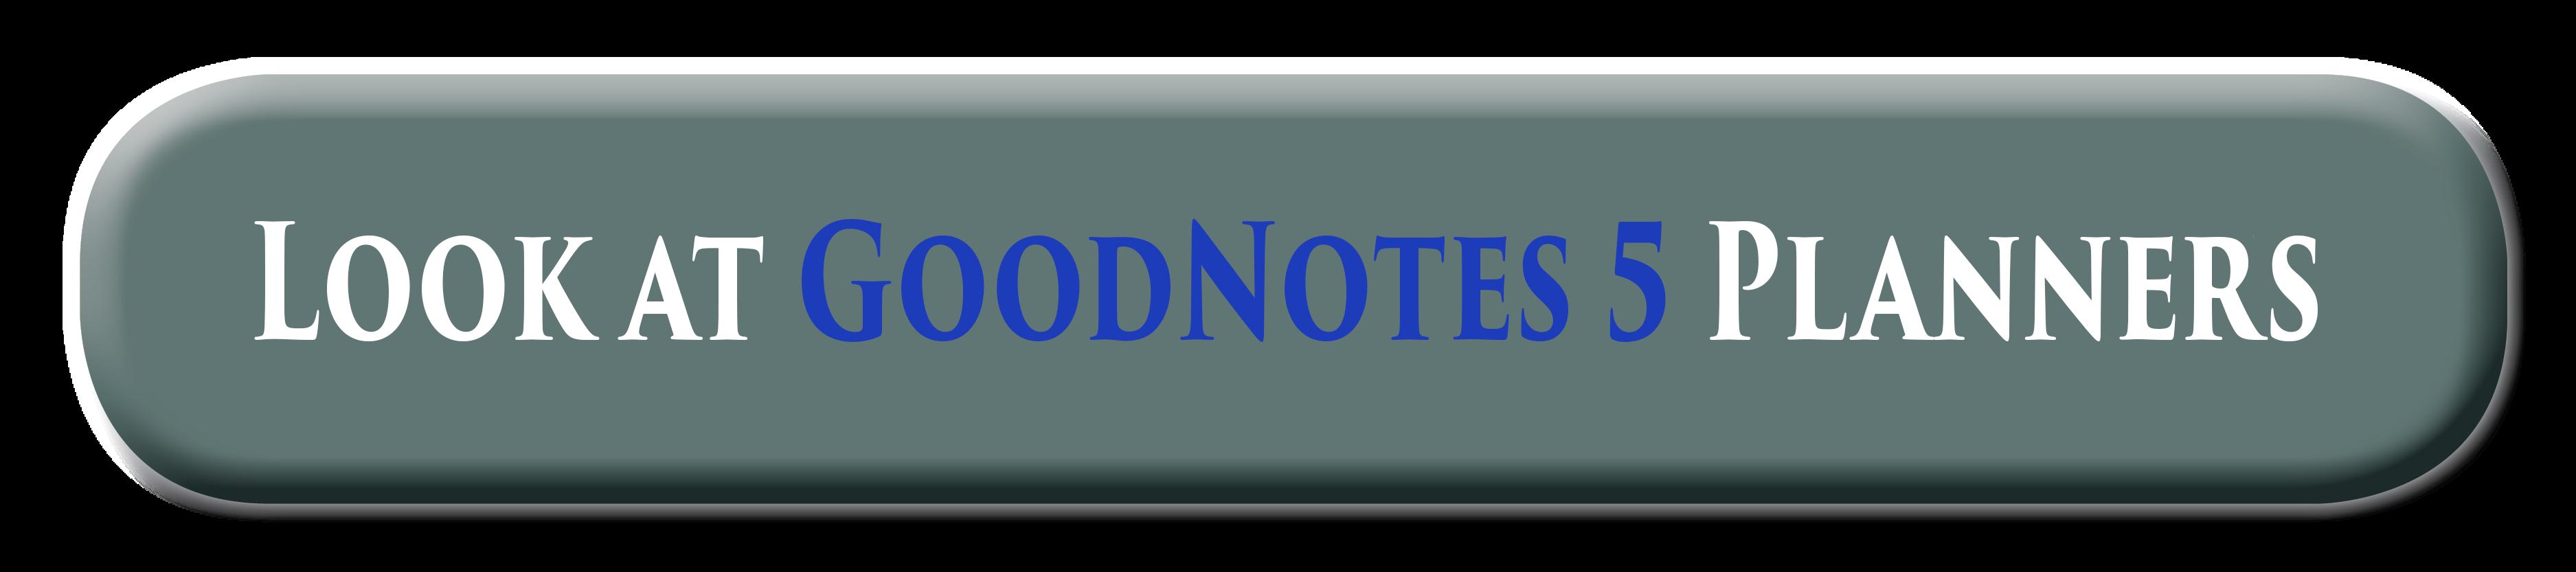 GoodNotes Digital Hobonichi Planner ipadplanner.com